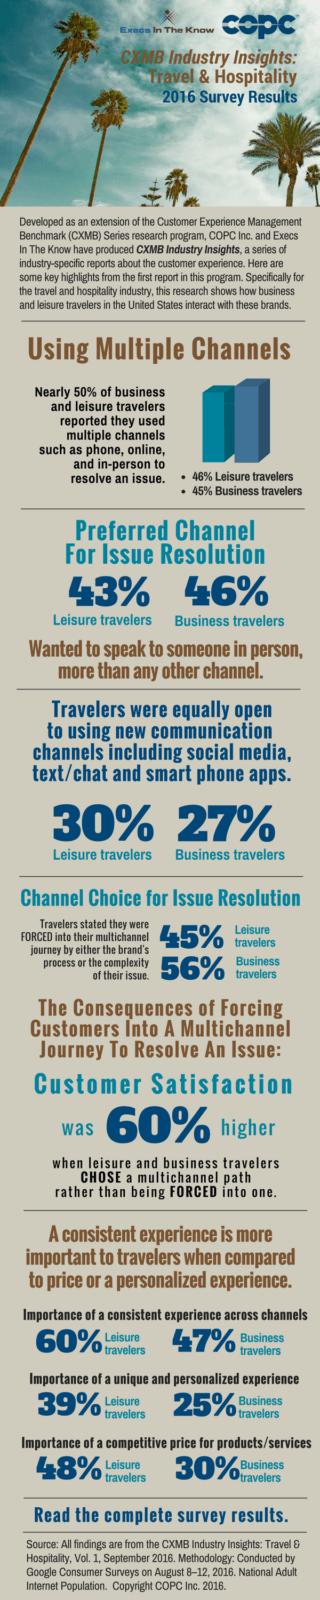 travel-survey-infographic-nov-2016-final